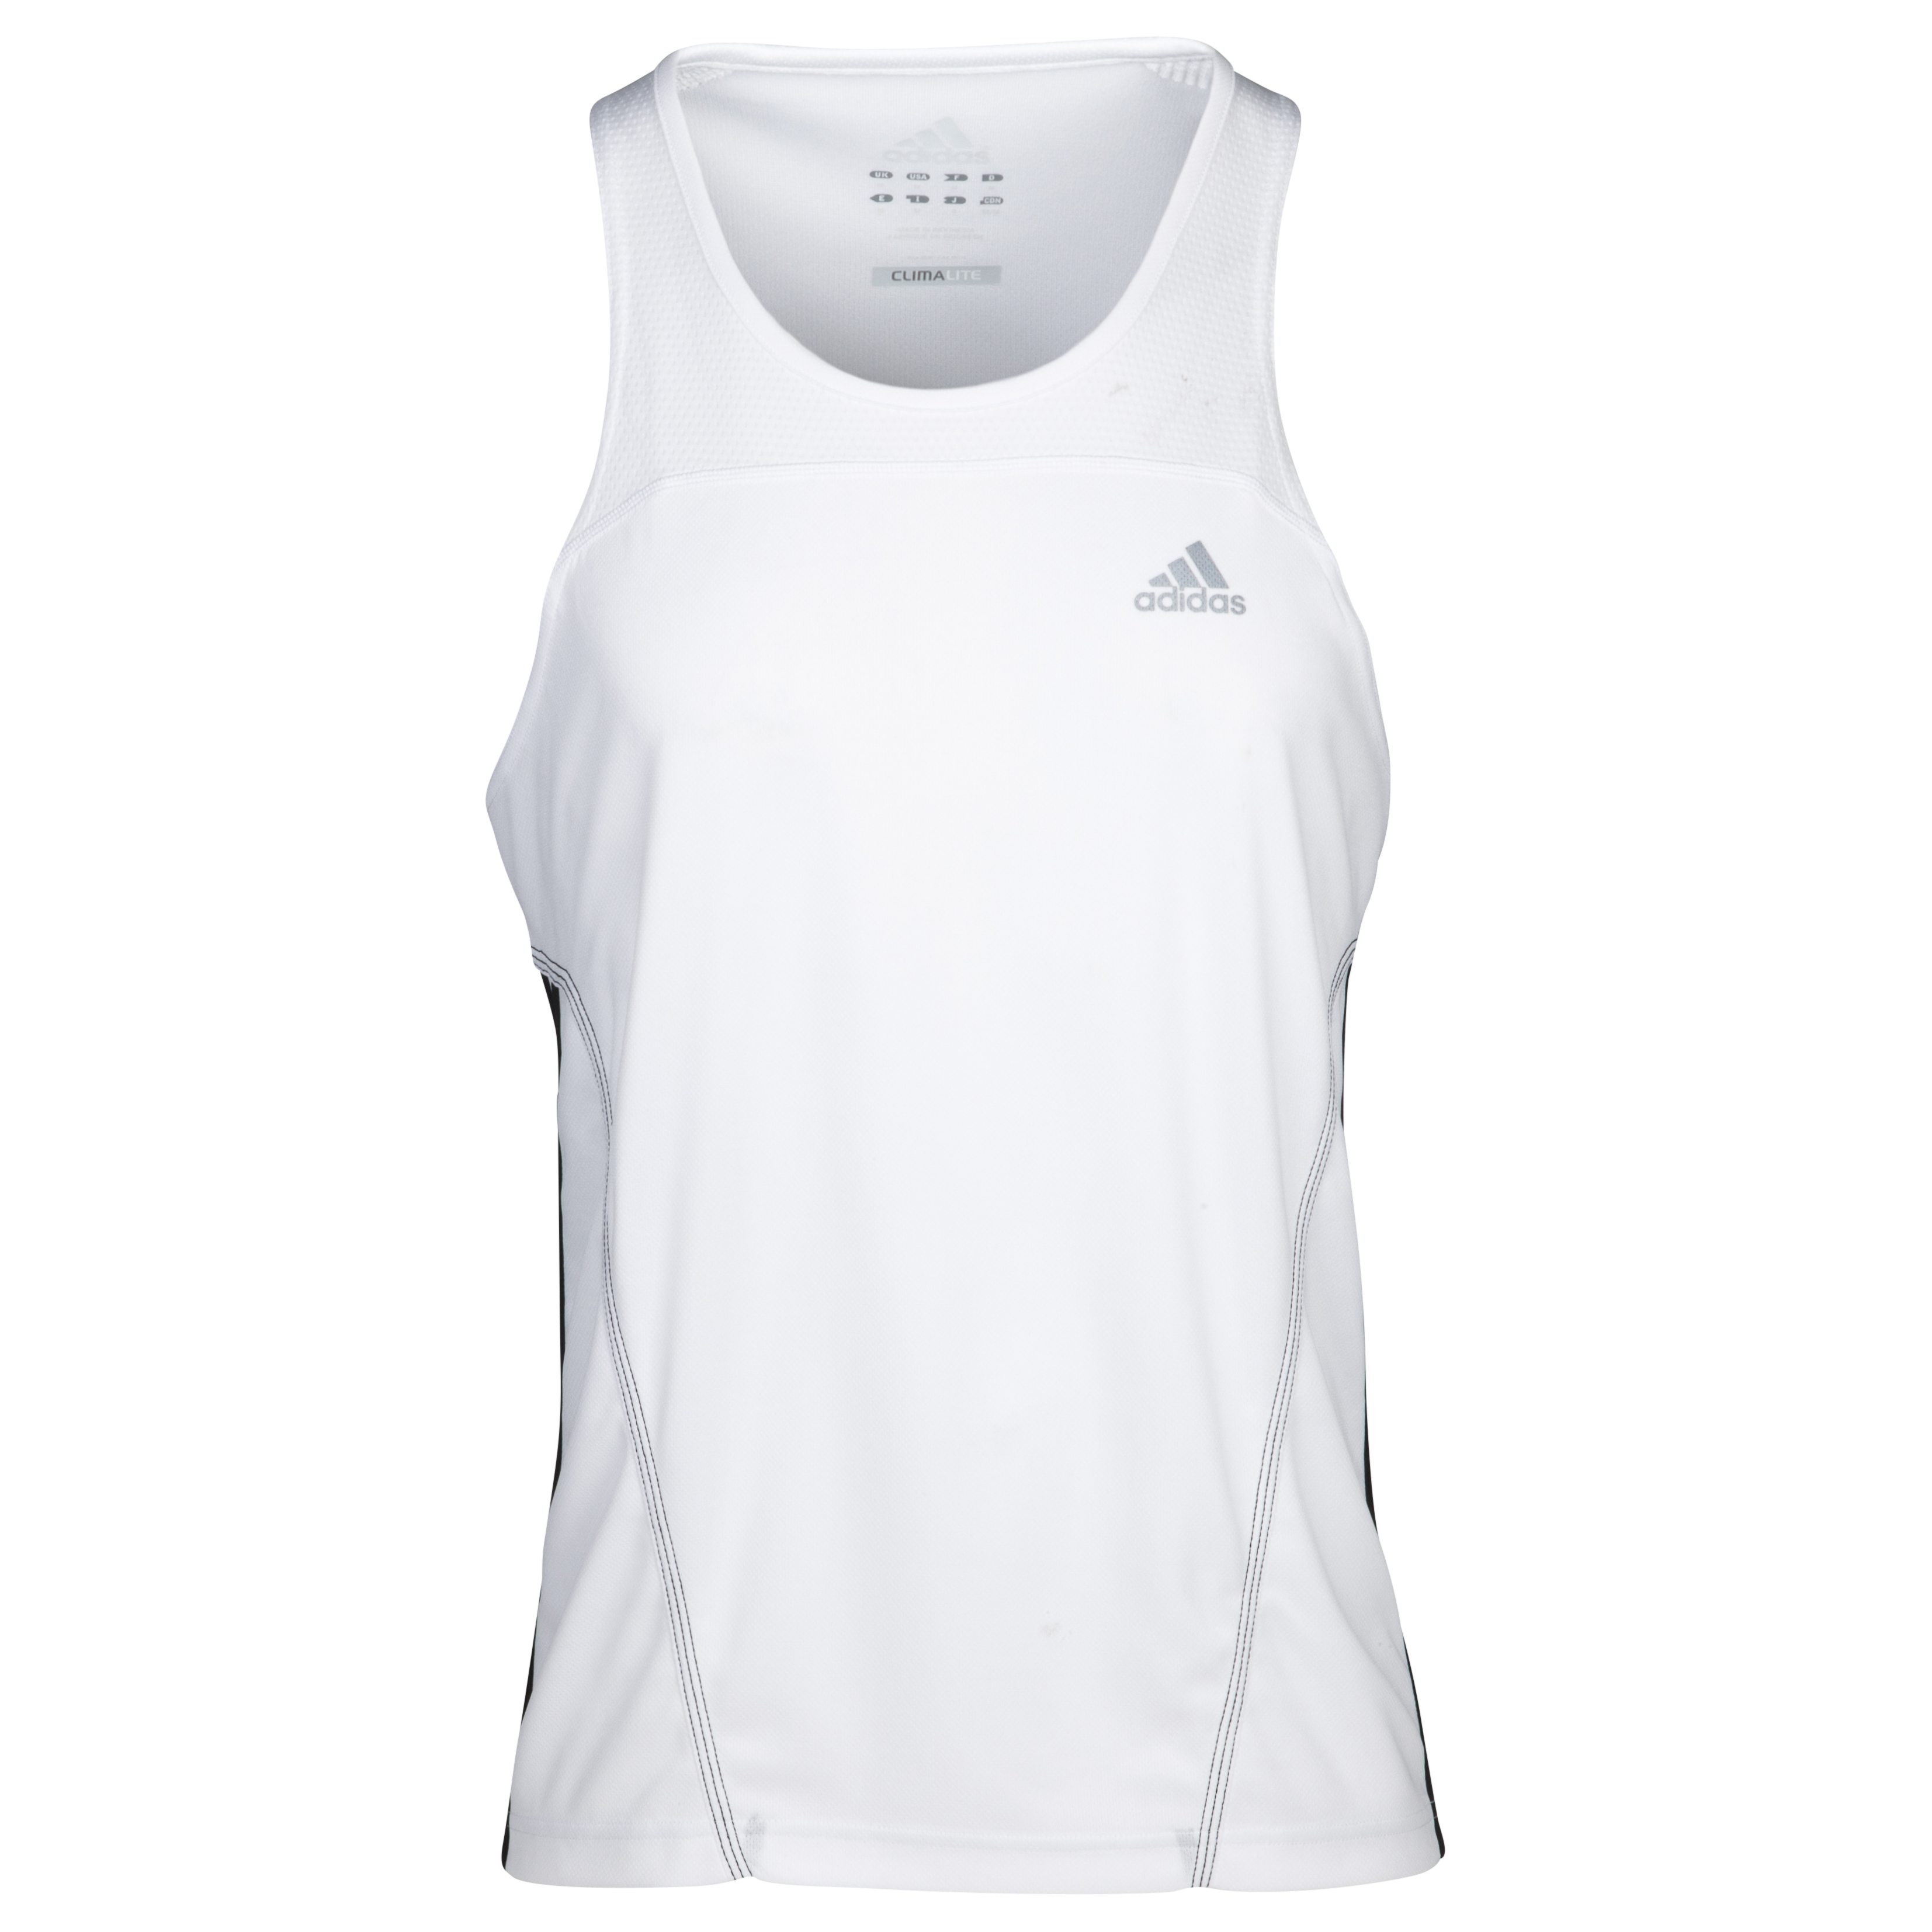 Adidas Response DS Singlet Vest - White/Black